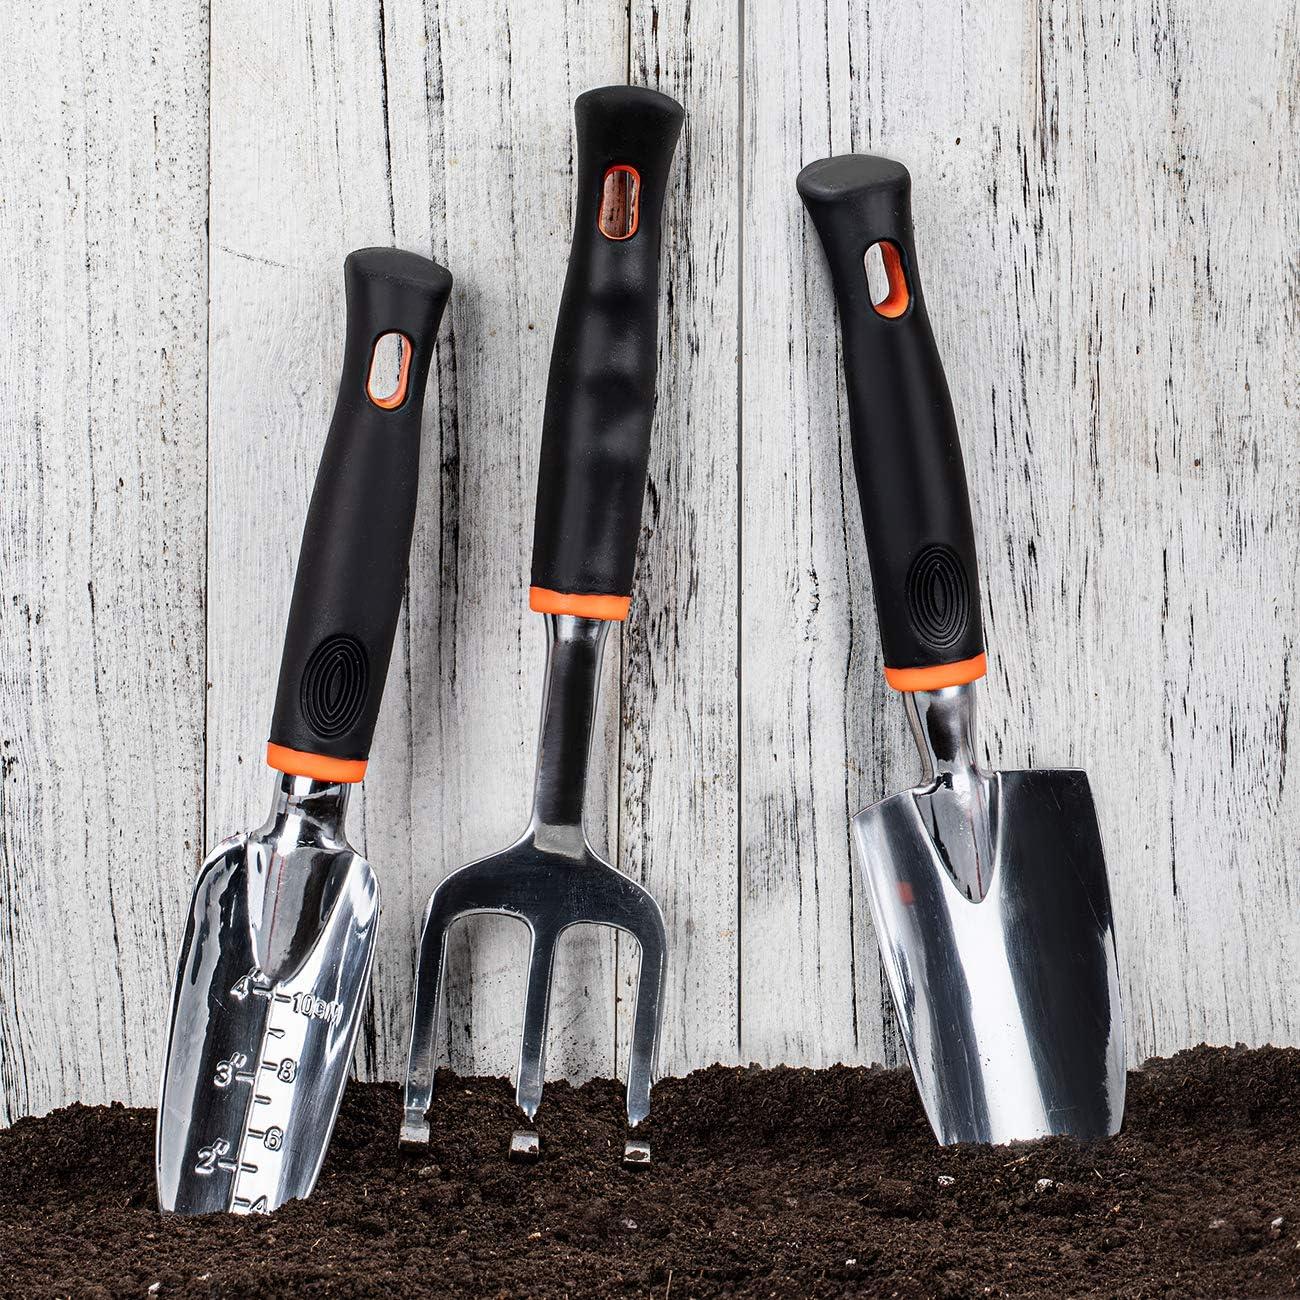 COSYLAND Garden Tool Set Gardening Kit Includes Cultivator 3 Piece Garden Hand Shovels Aluminum Alloy Garden Trowels with Ergonomic Rubberized Non-Slip Grip Hand Trowel and Transplant Trowel